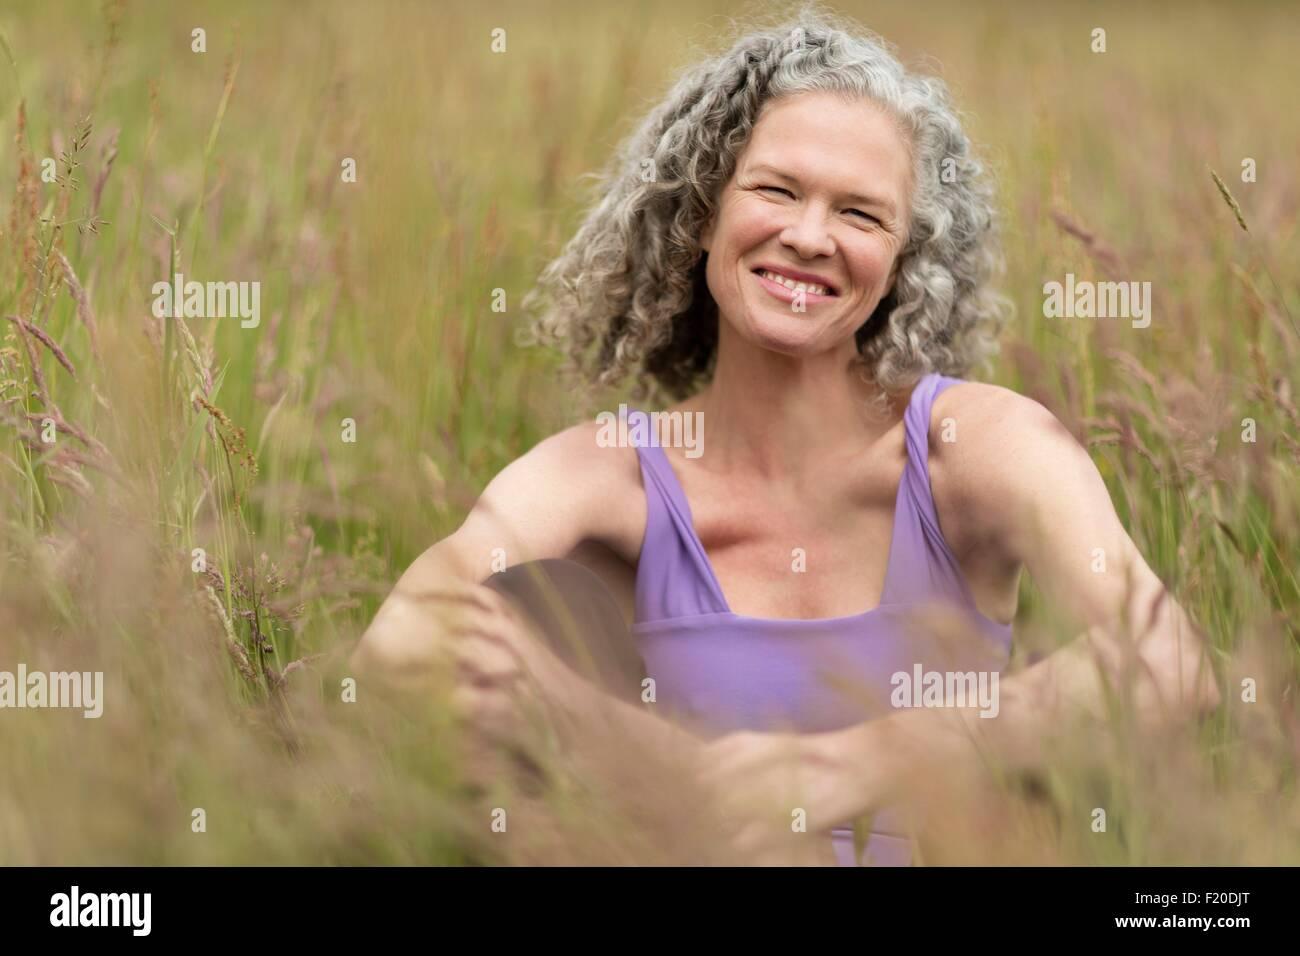 Pics mature natural Category:Unshaved genitalia